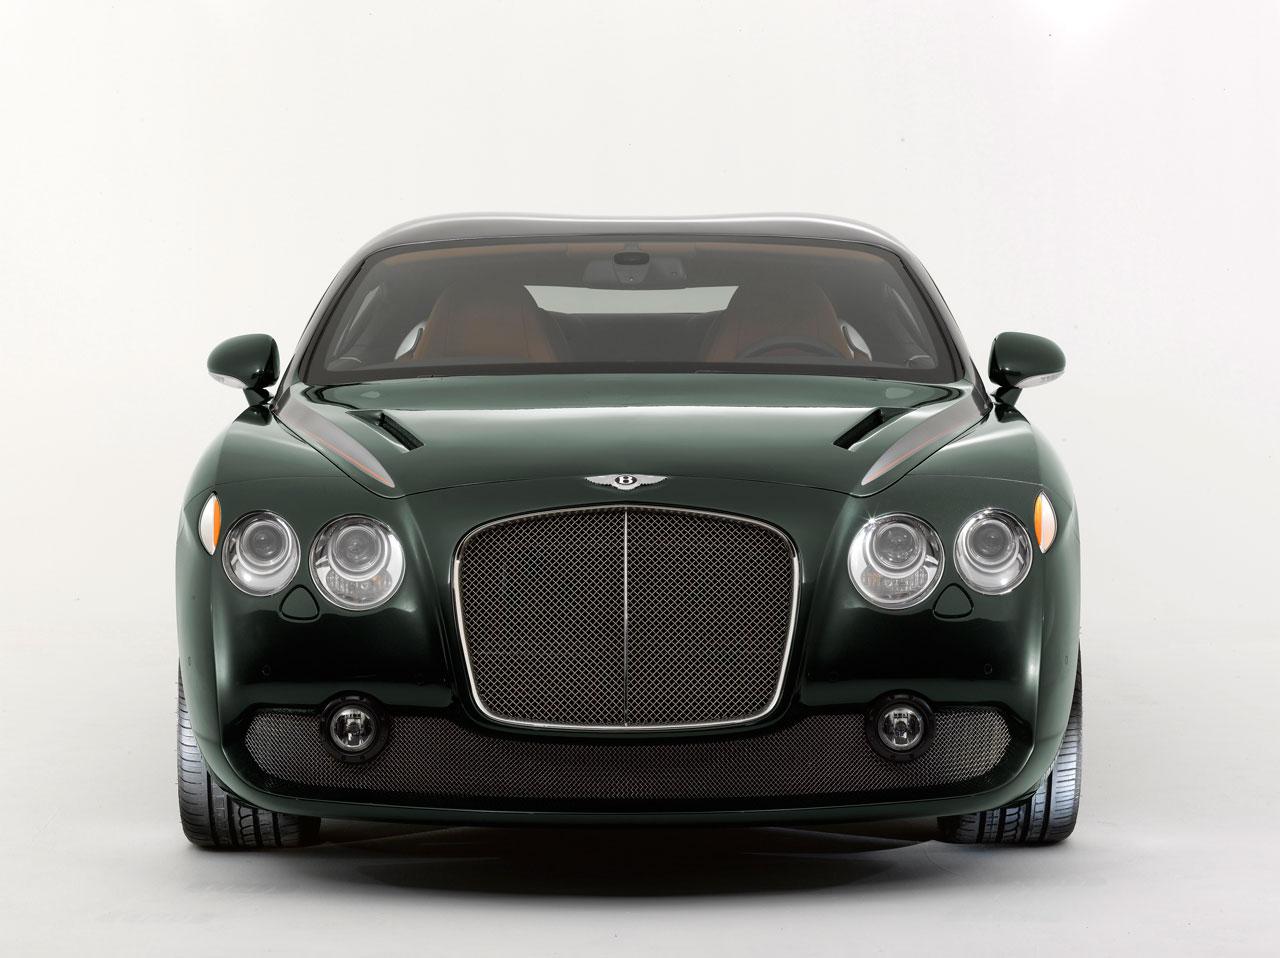 Bentley gtz zagato 2008 supercar sketches gallery bentley gtz zagato 2008 vanachro Images